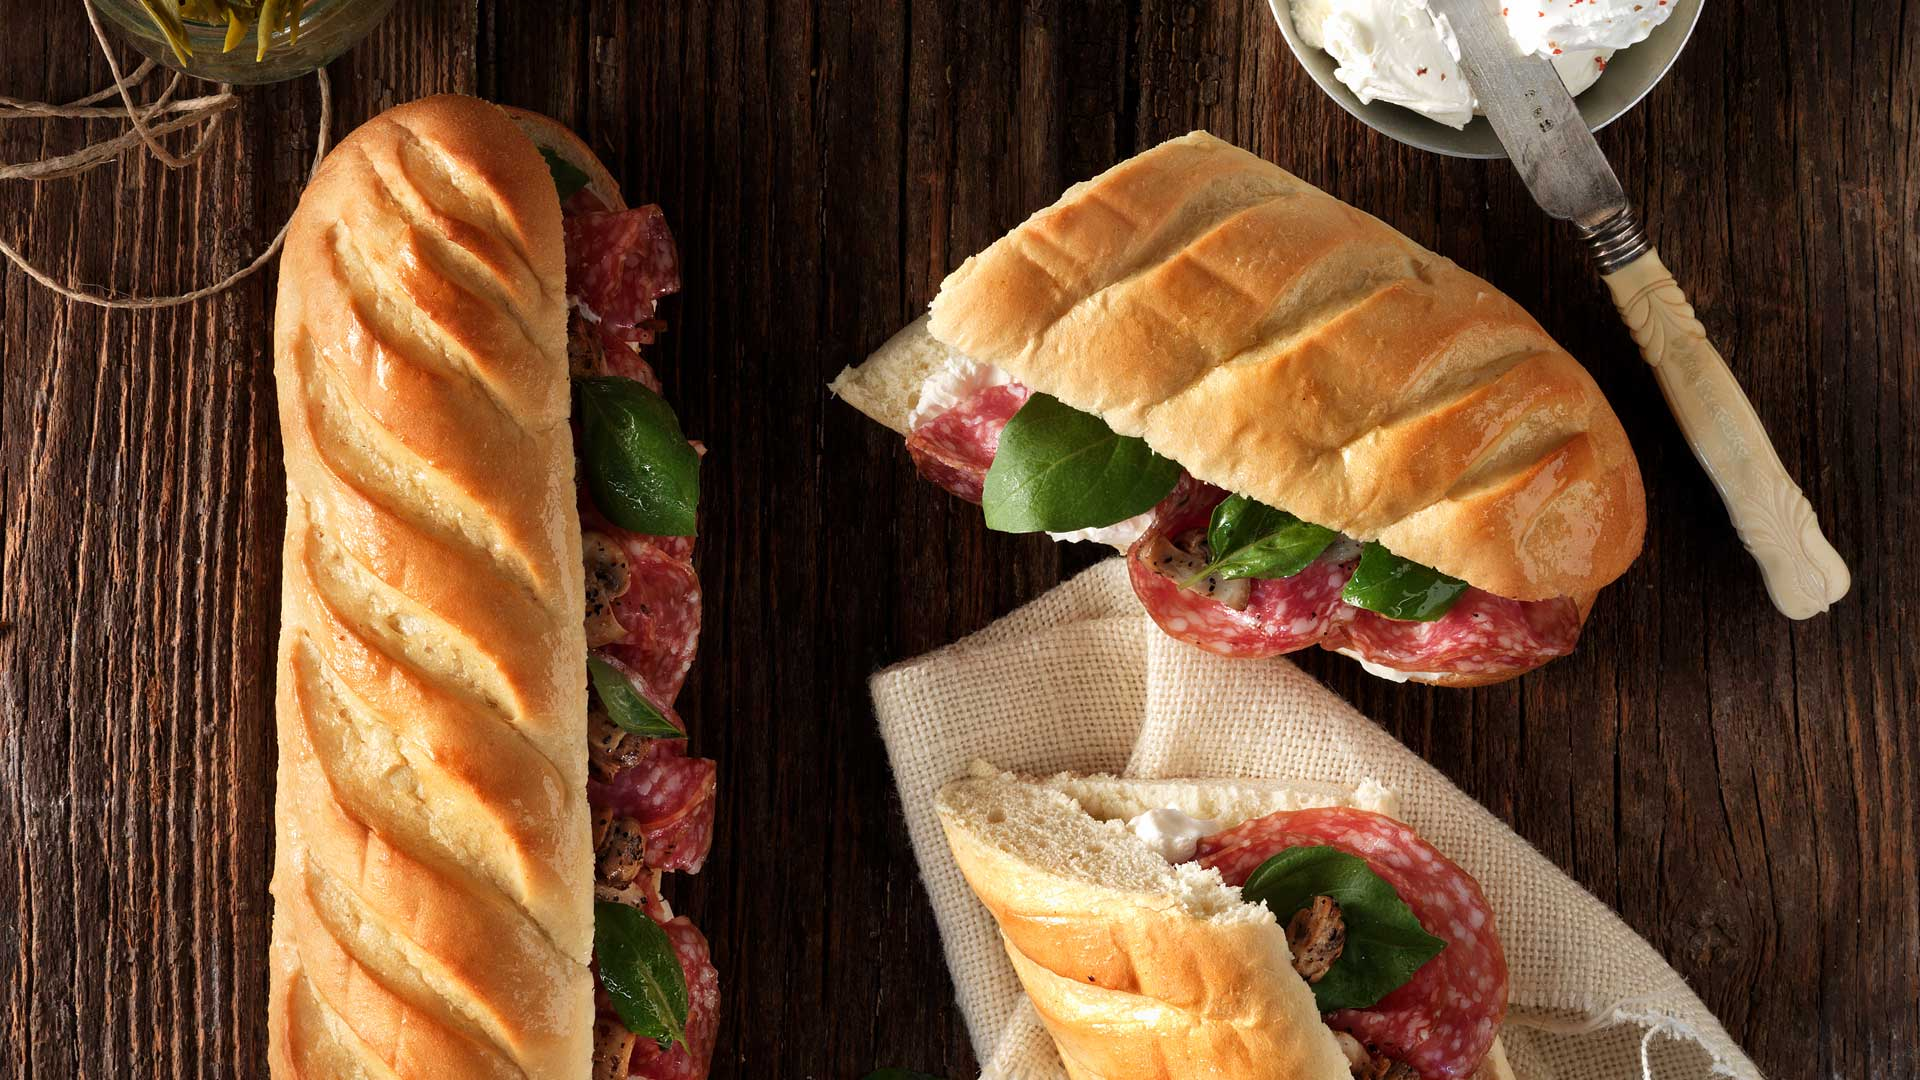 select-baguette-viennese-